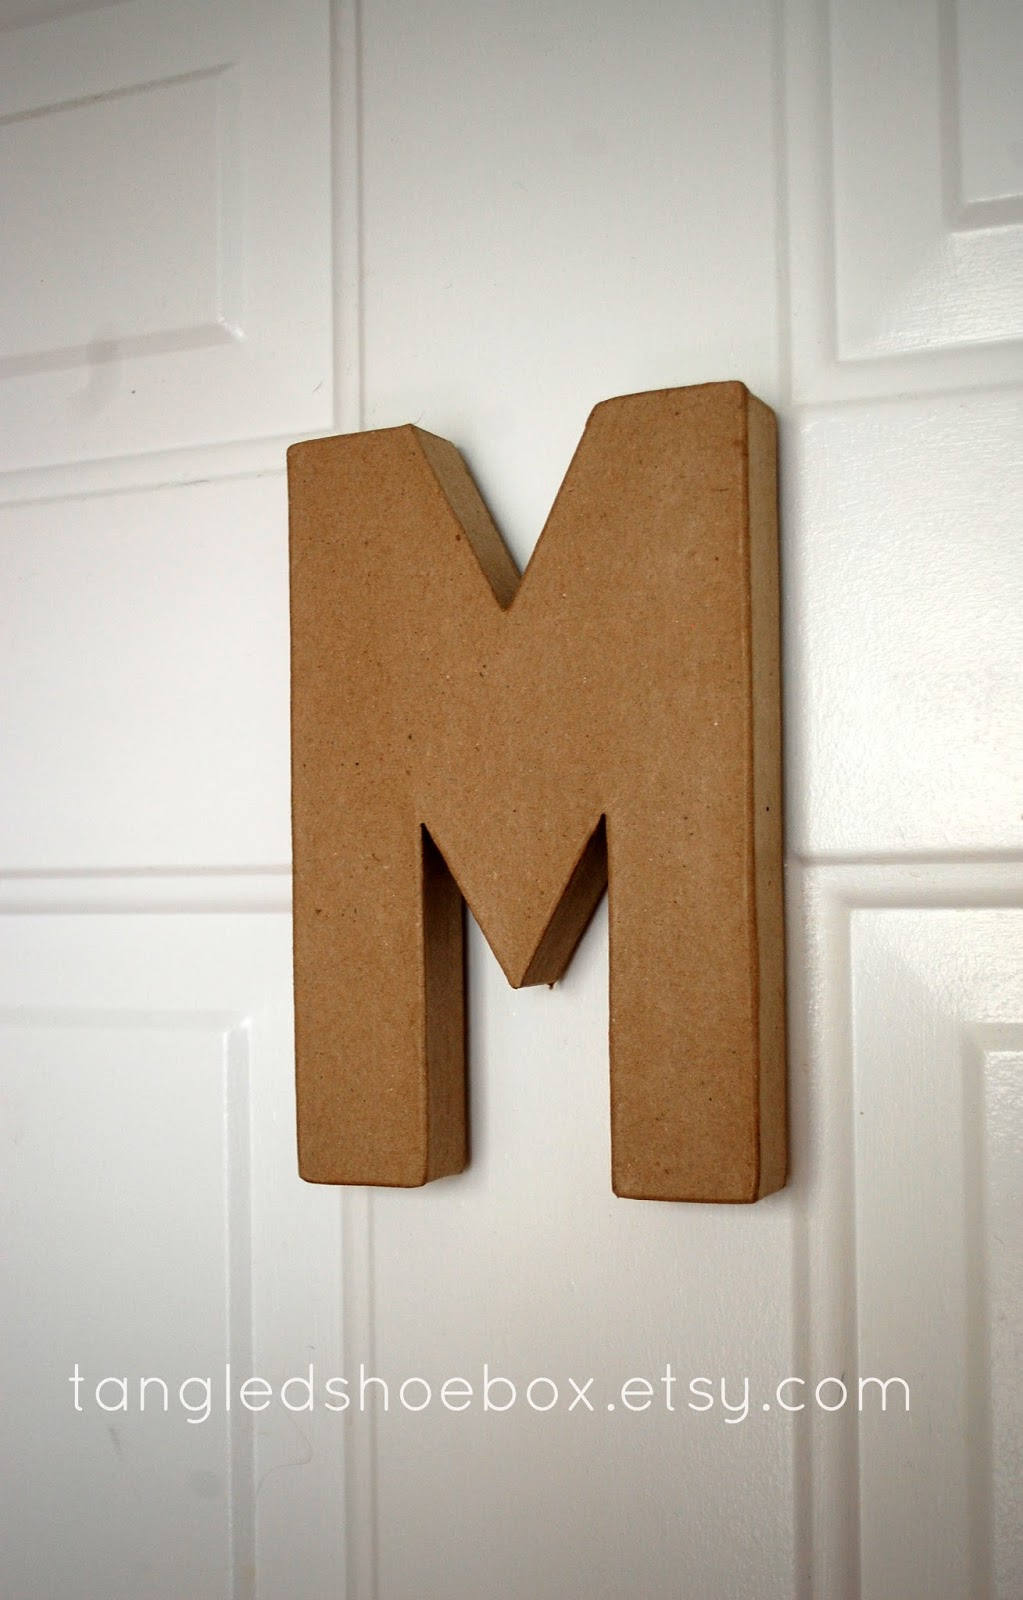 Tangled Shoebox 3d Cardboard Letter Magnet